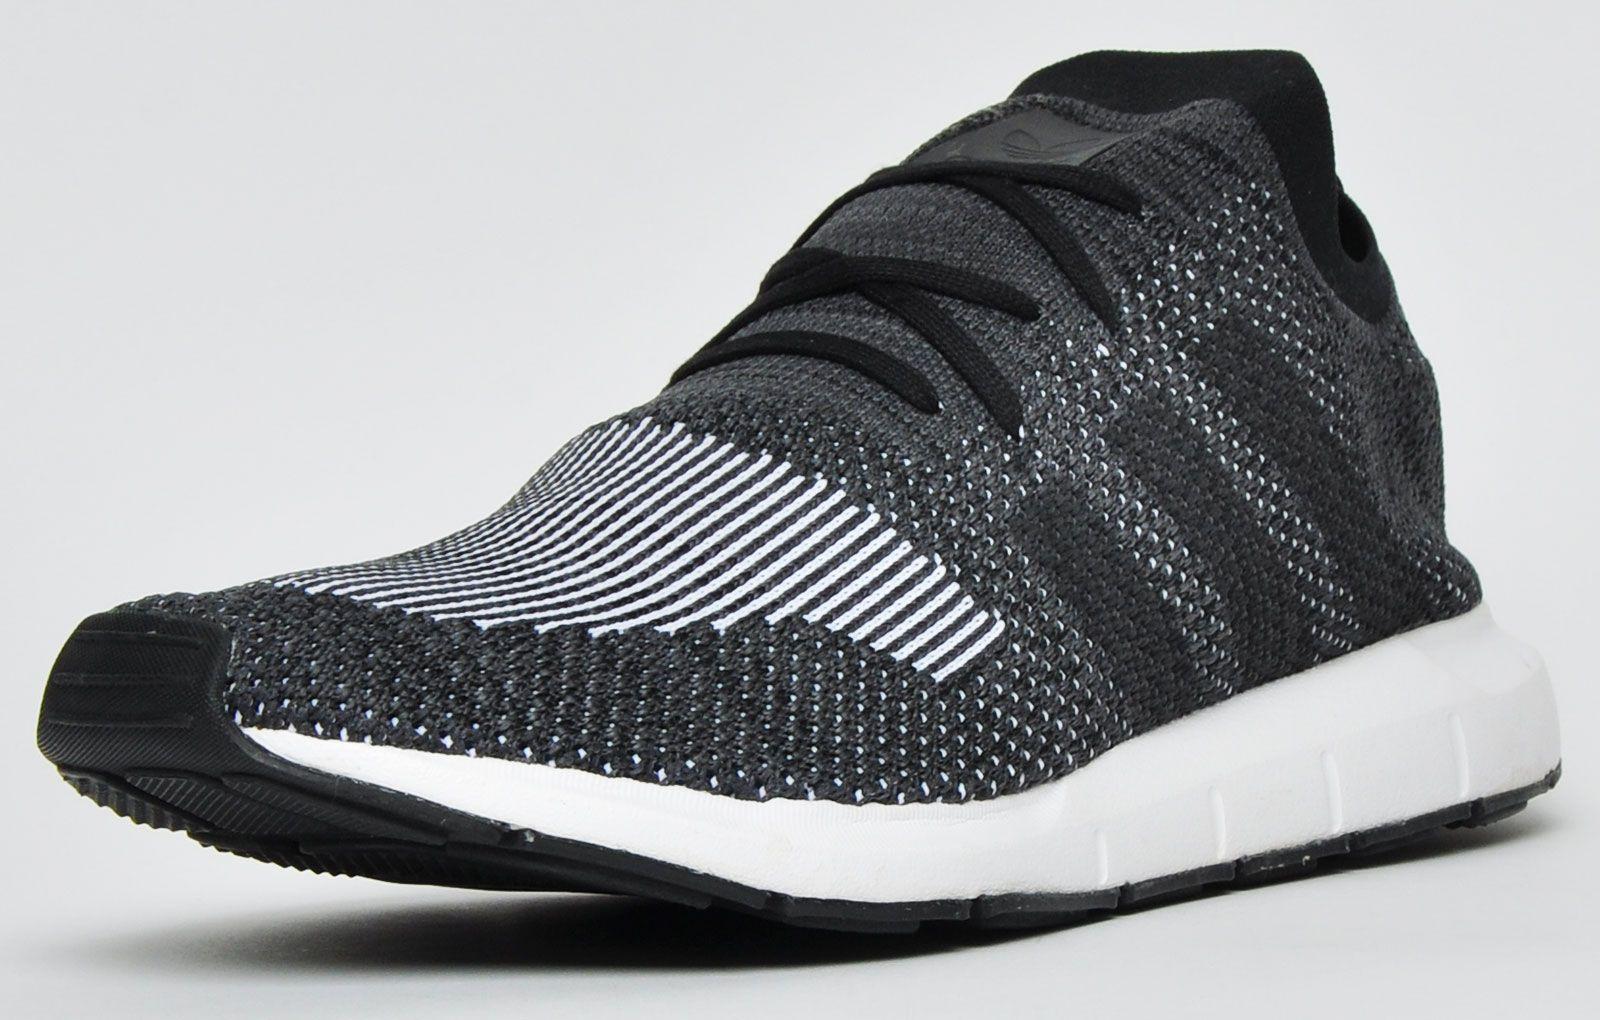 Adidas Originals Swift Run PK Primeknit Mens